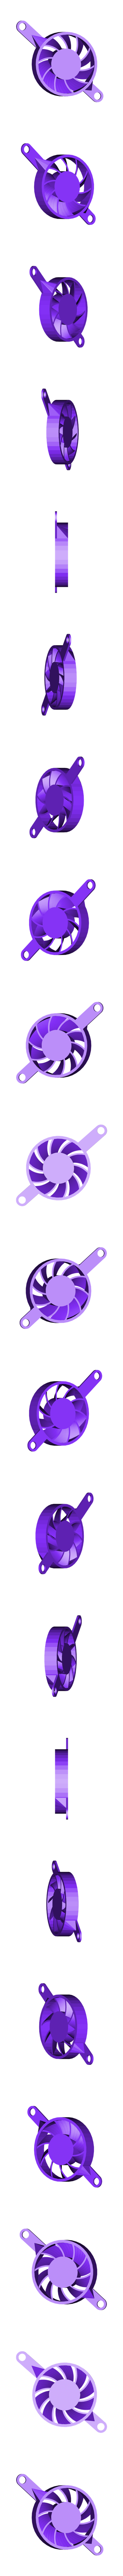 5015 fan shroud BOOST.stl Download STL file 5015 Blower fan static pressure booster! • 3D printing design, Rhett